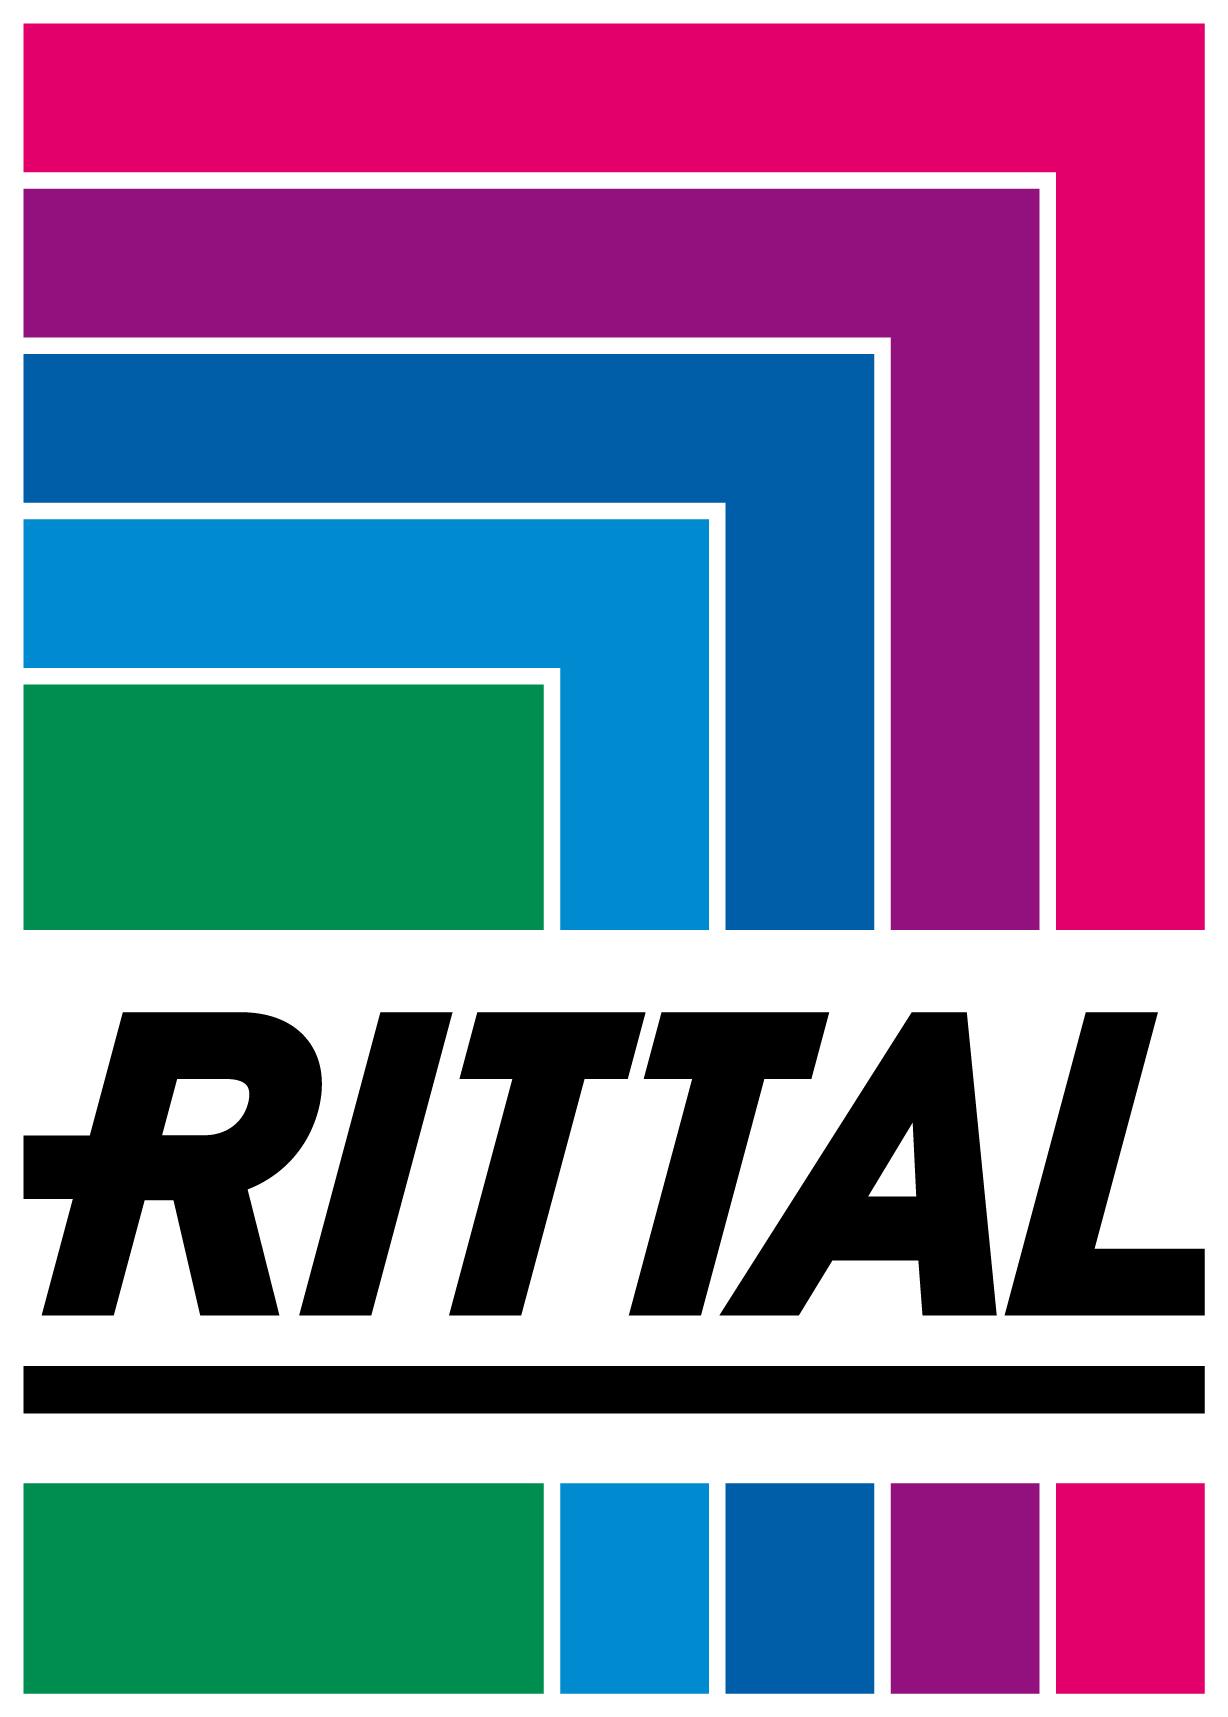 logo-rittal